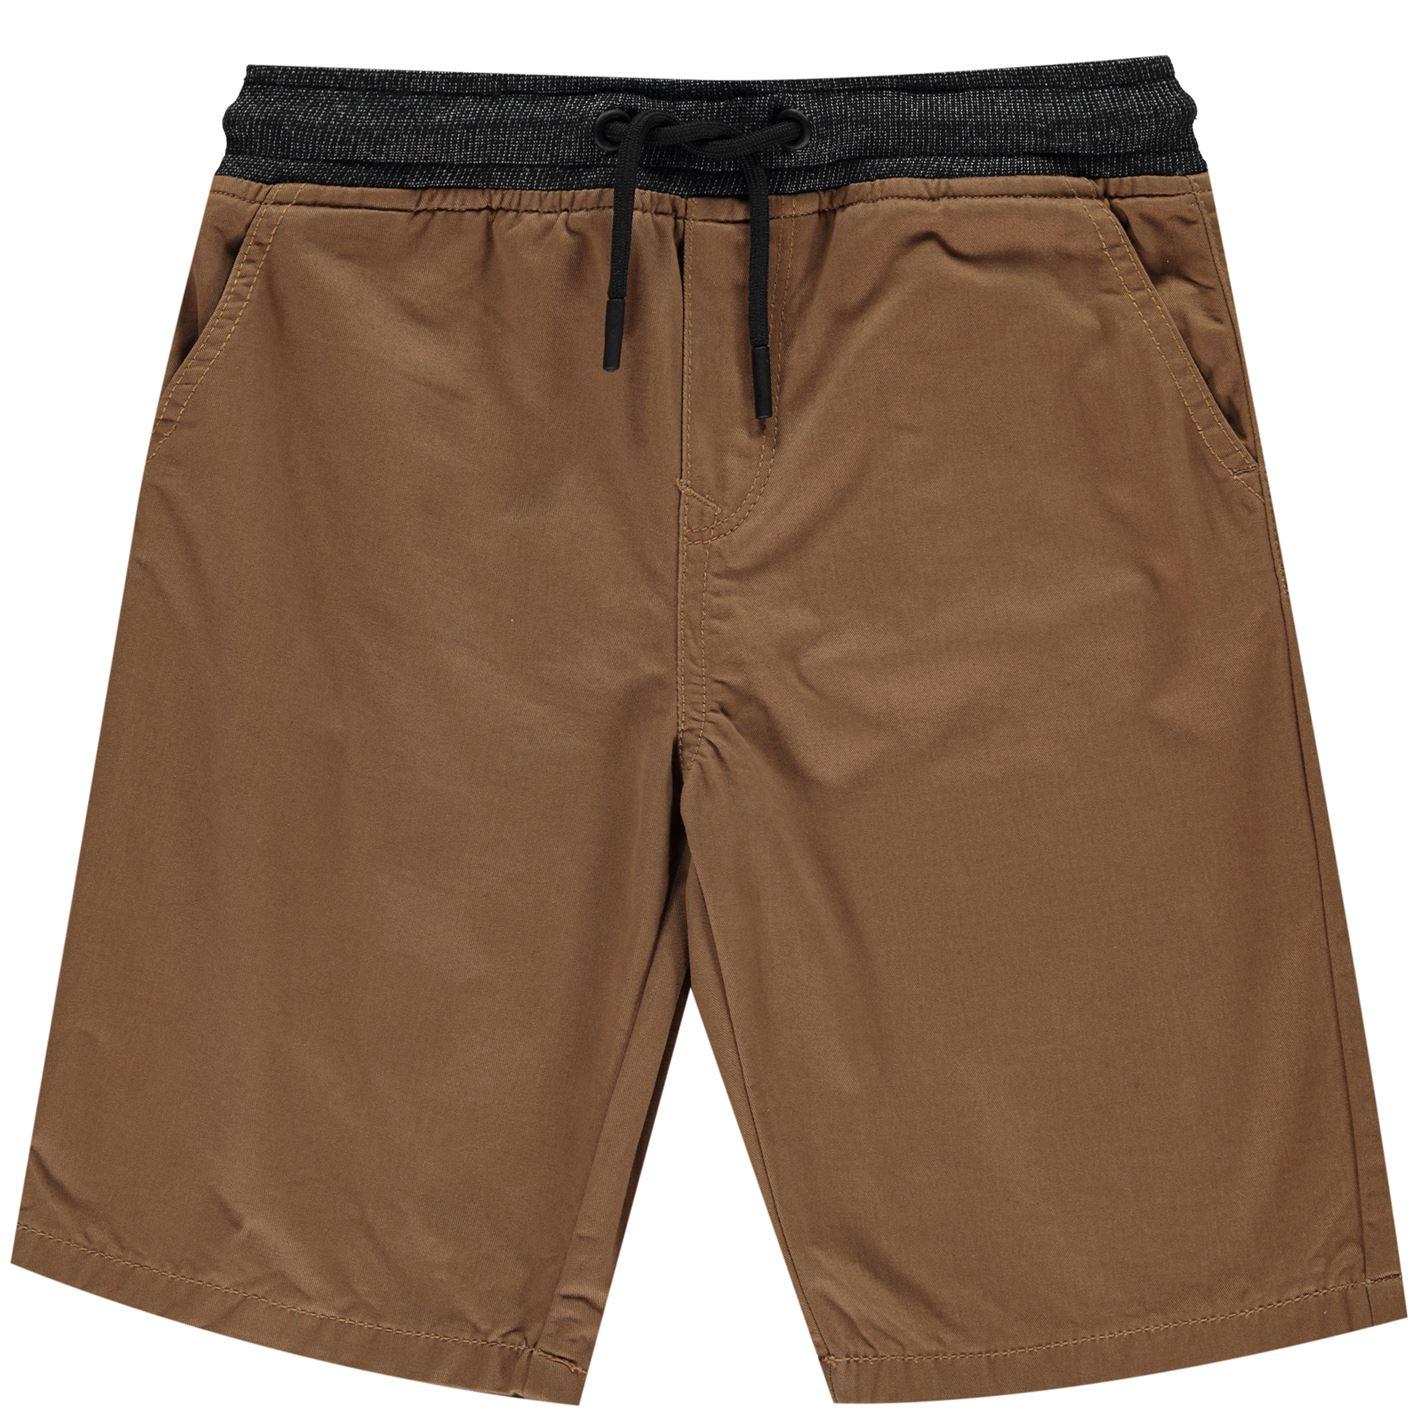 Pantaloni scurti No Fear Chino pentru baietei maro